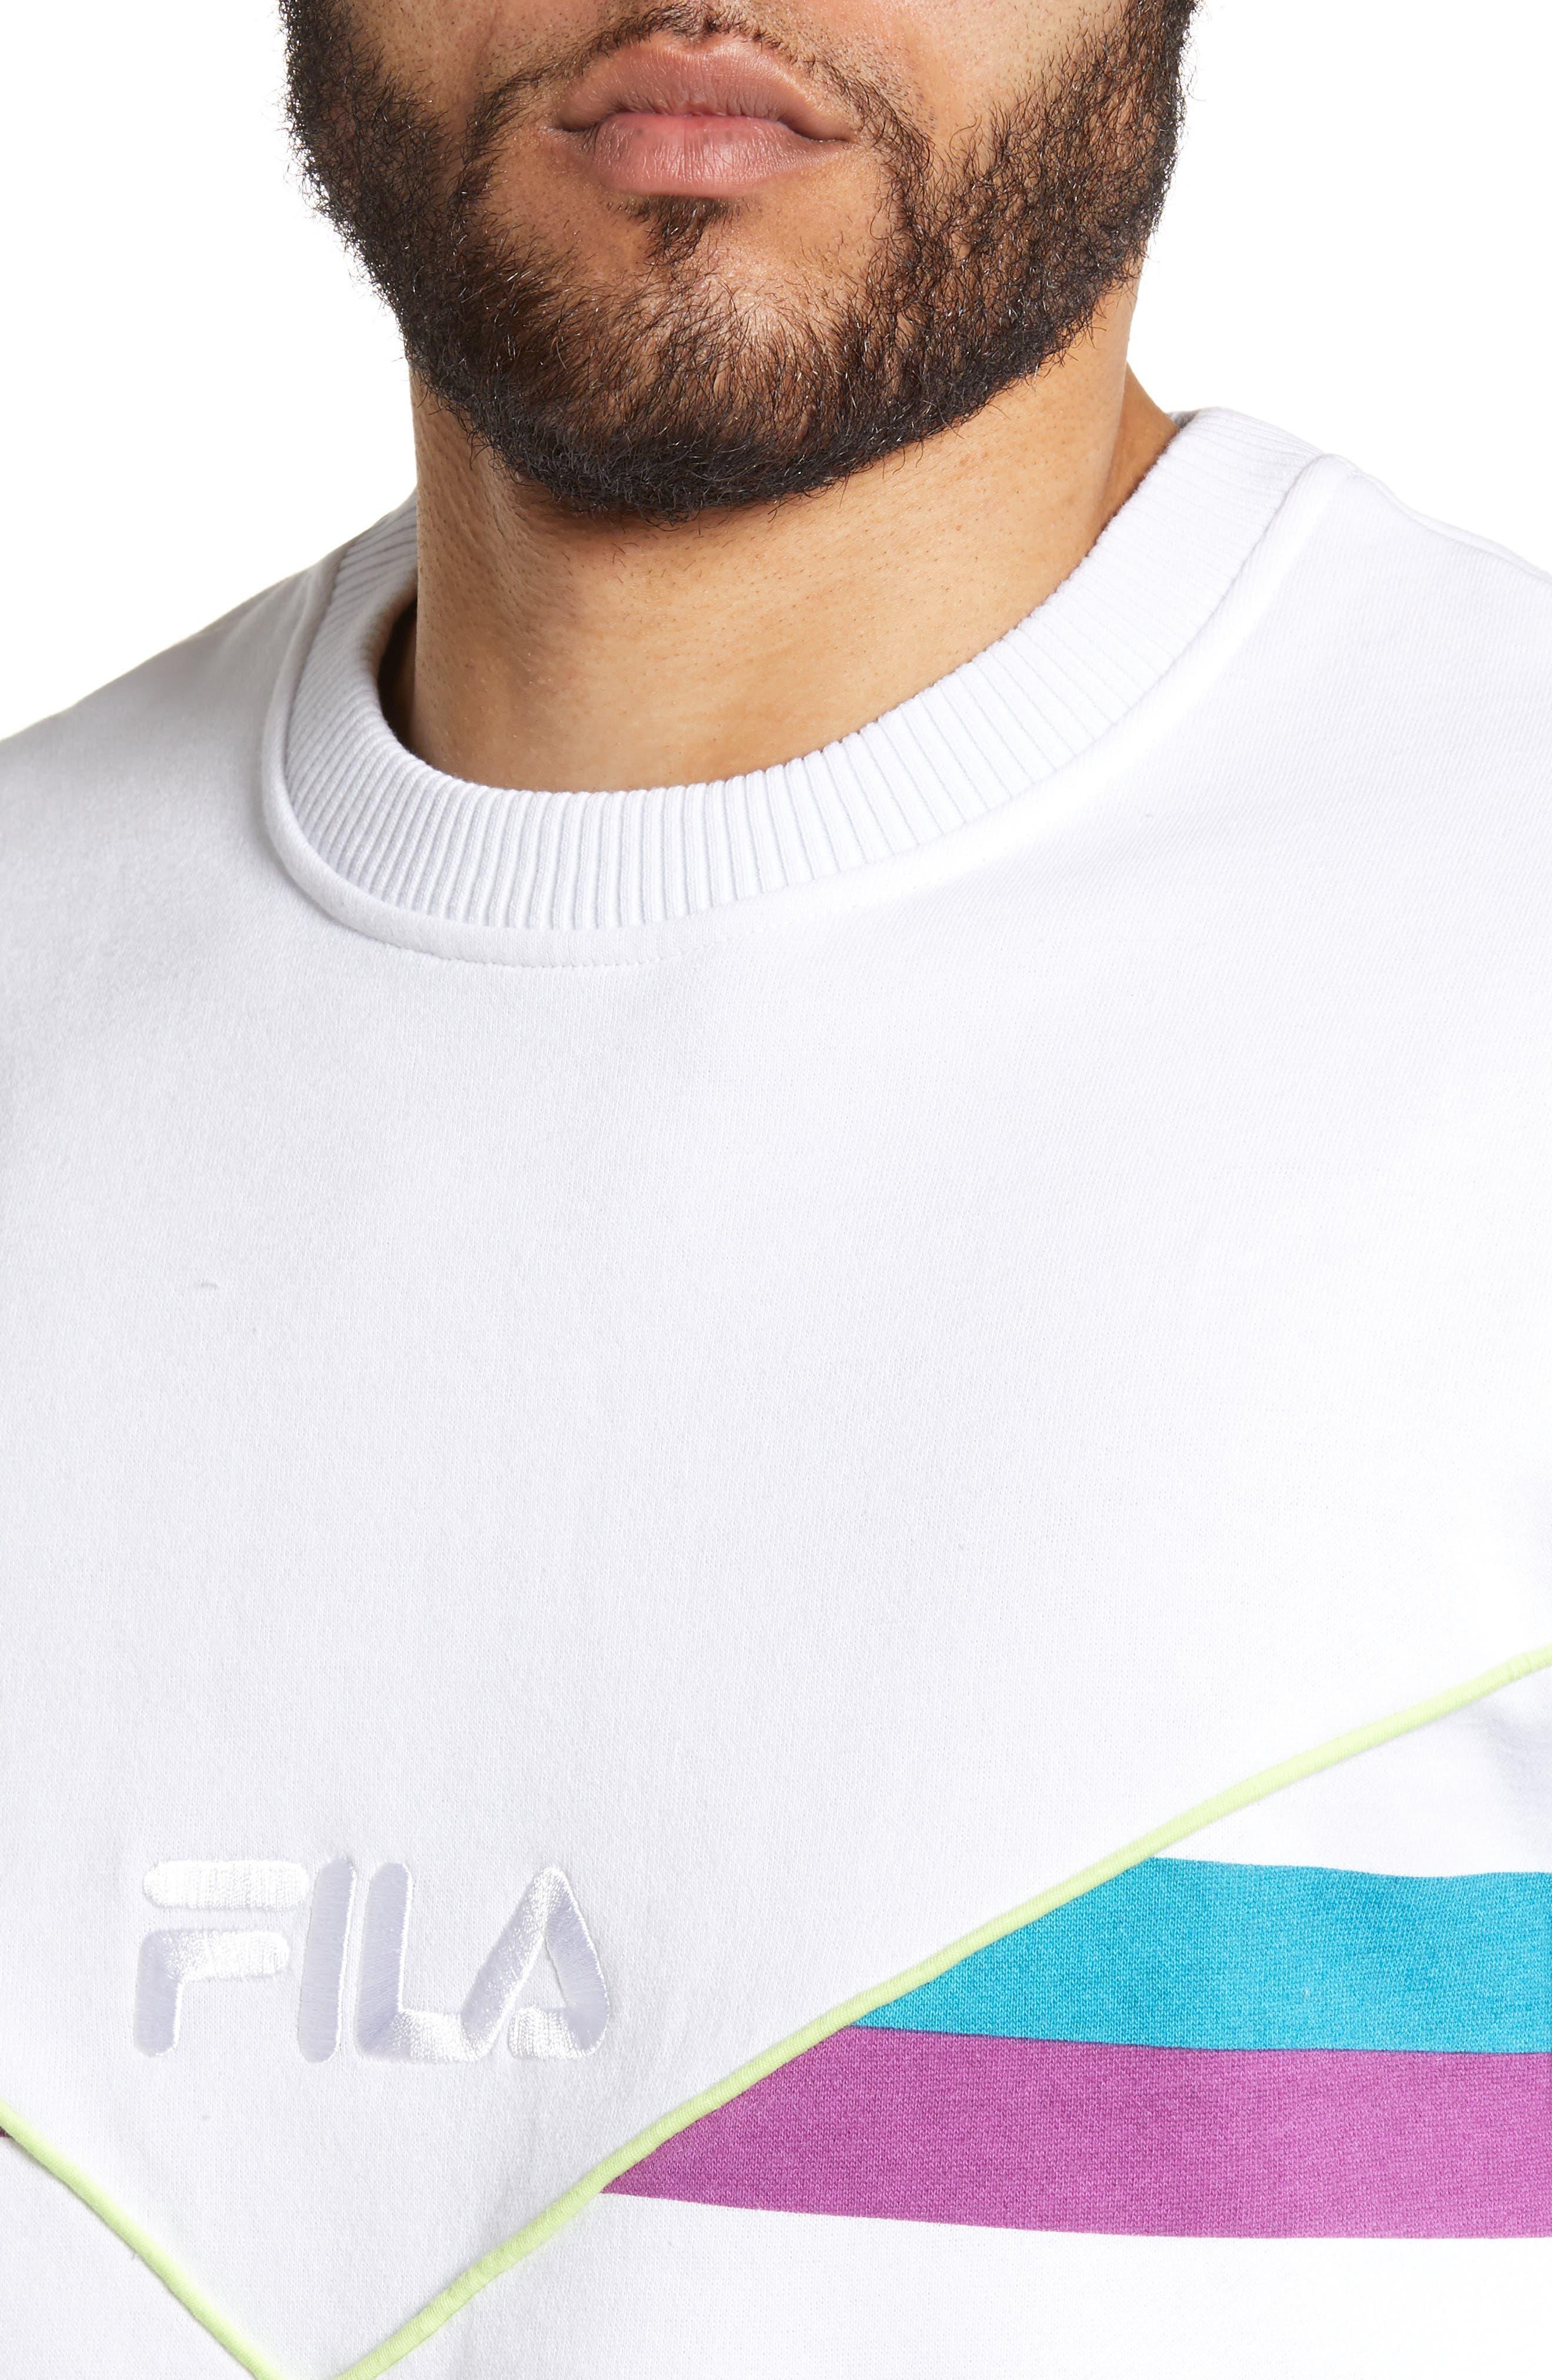 FILA, Leroy Chevron Sweatshirt, Alternate thumbnail 4, color, WHITE